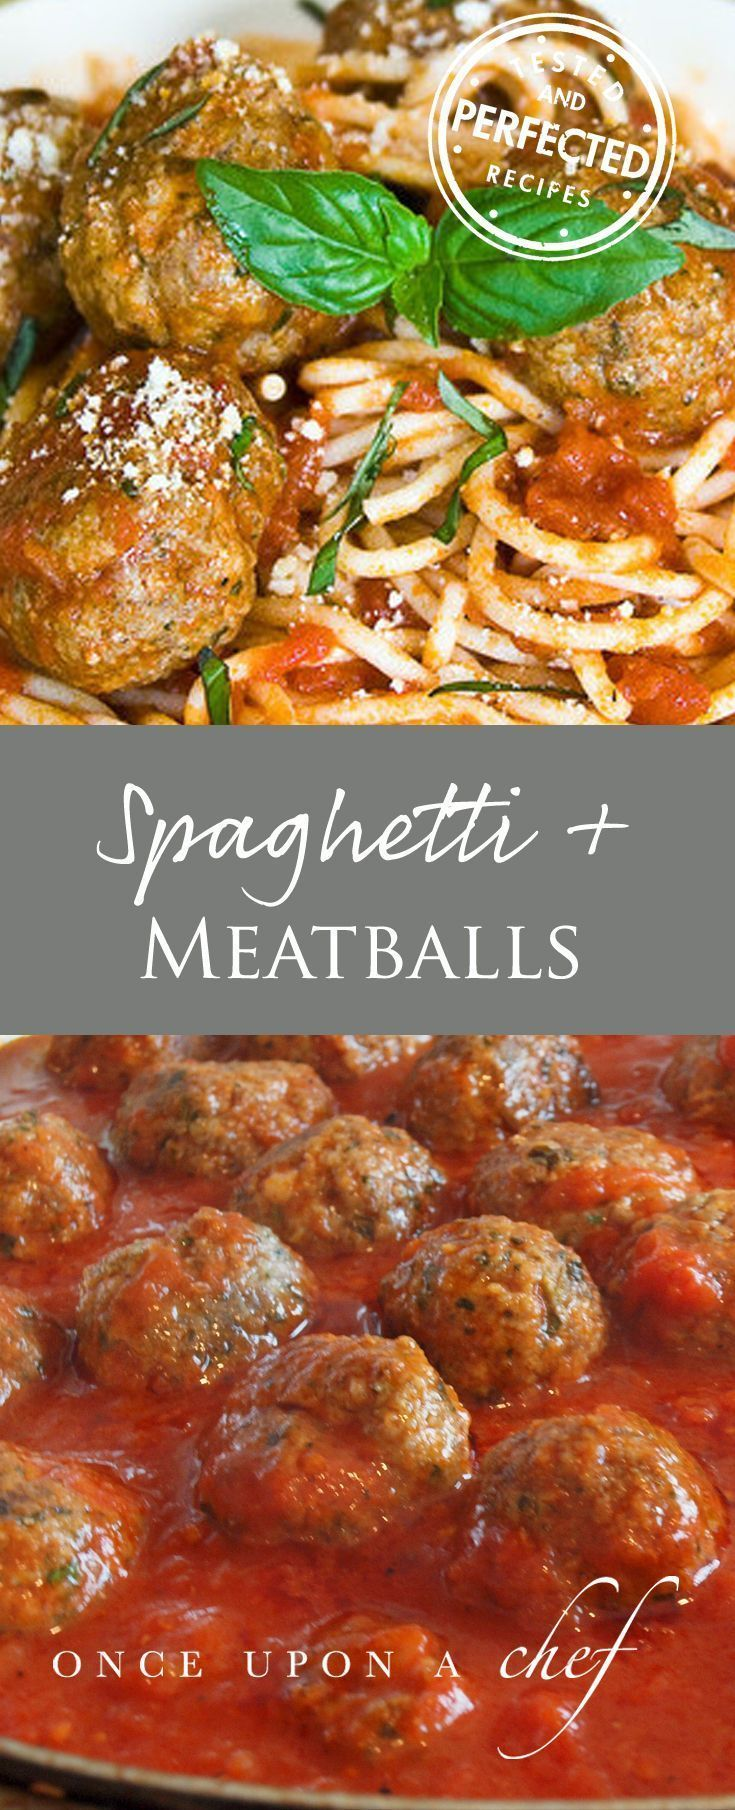 Spaghetti and Meatballs #dinnerrecipe #spaghetti #spaghettiandmeatballs